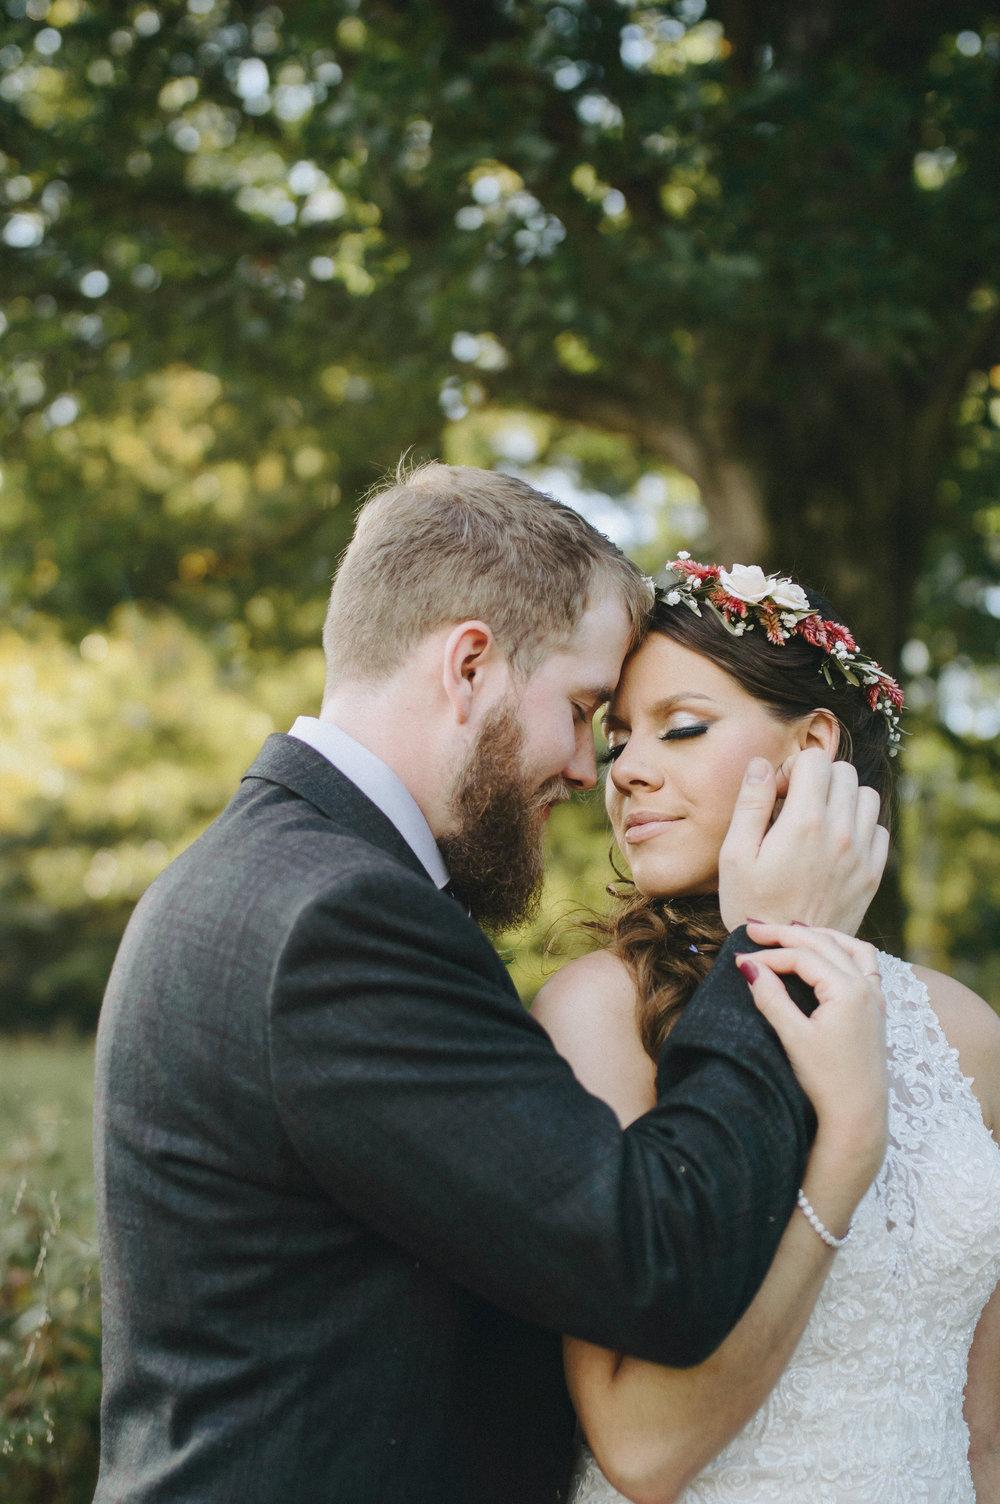 Lauren_Dustin_Wedding - EDITS-24.jpg